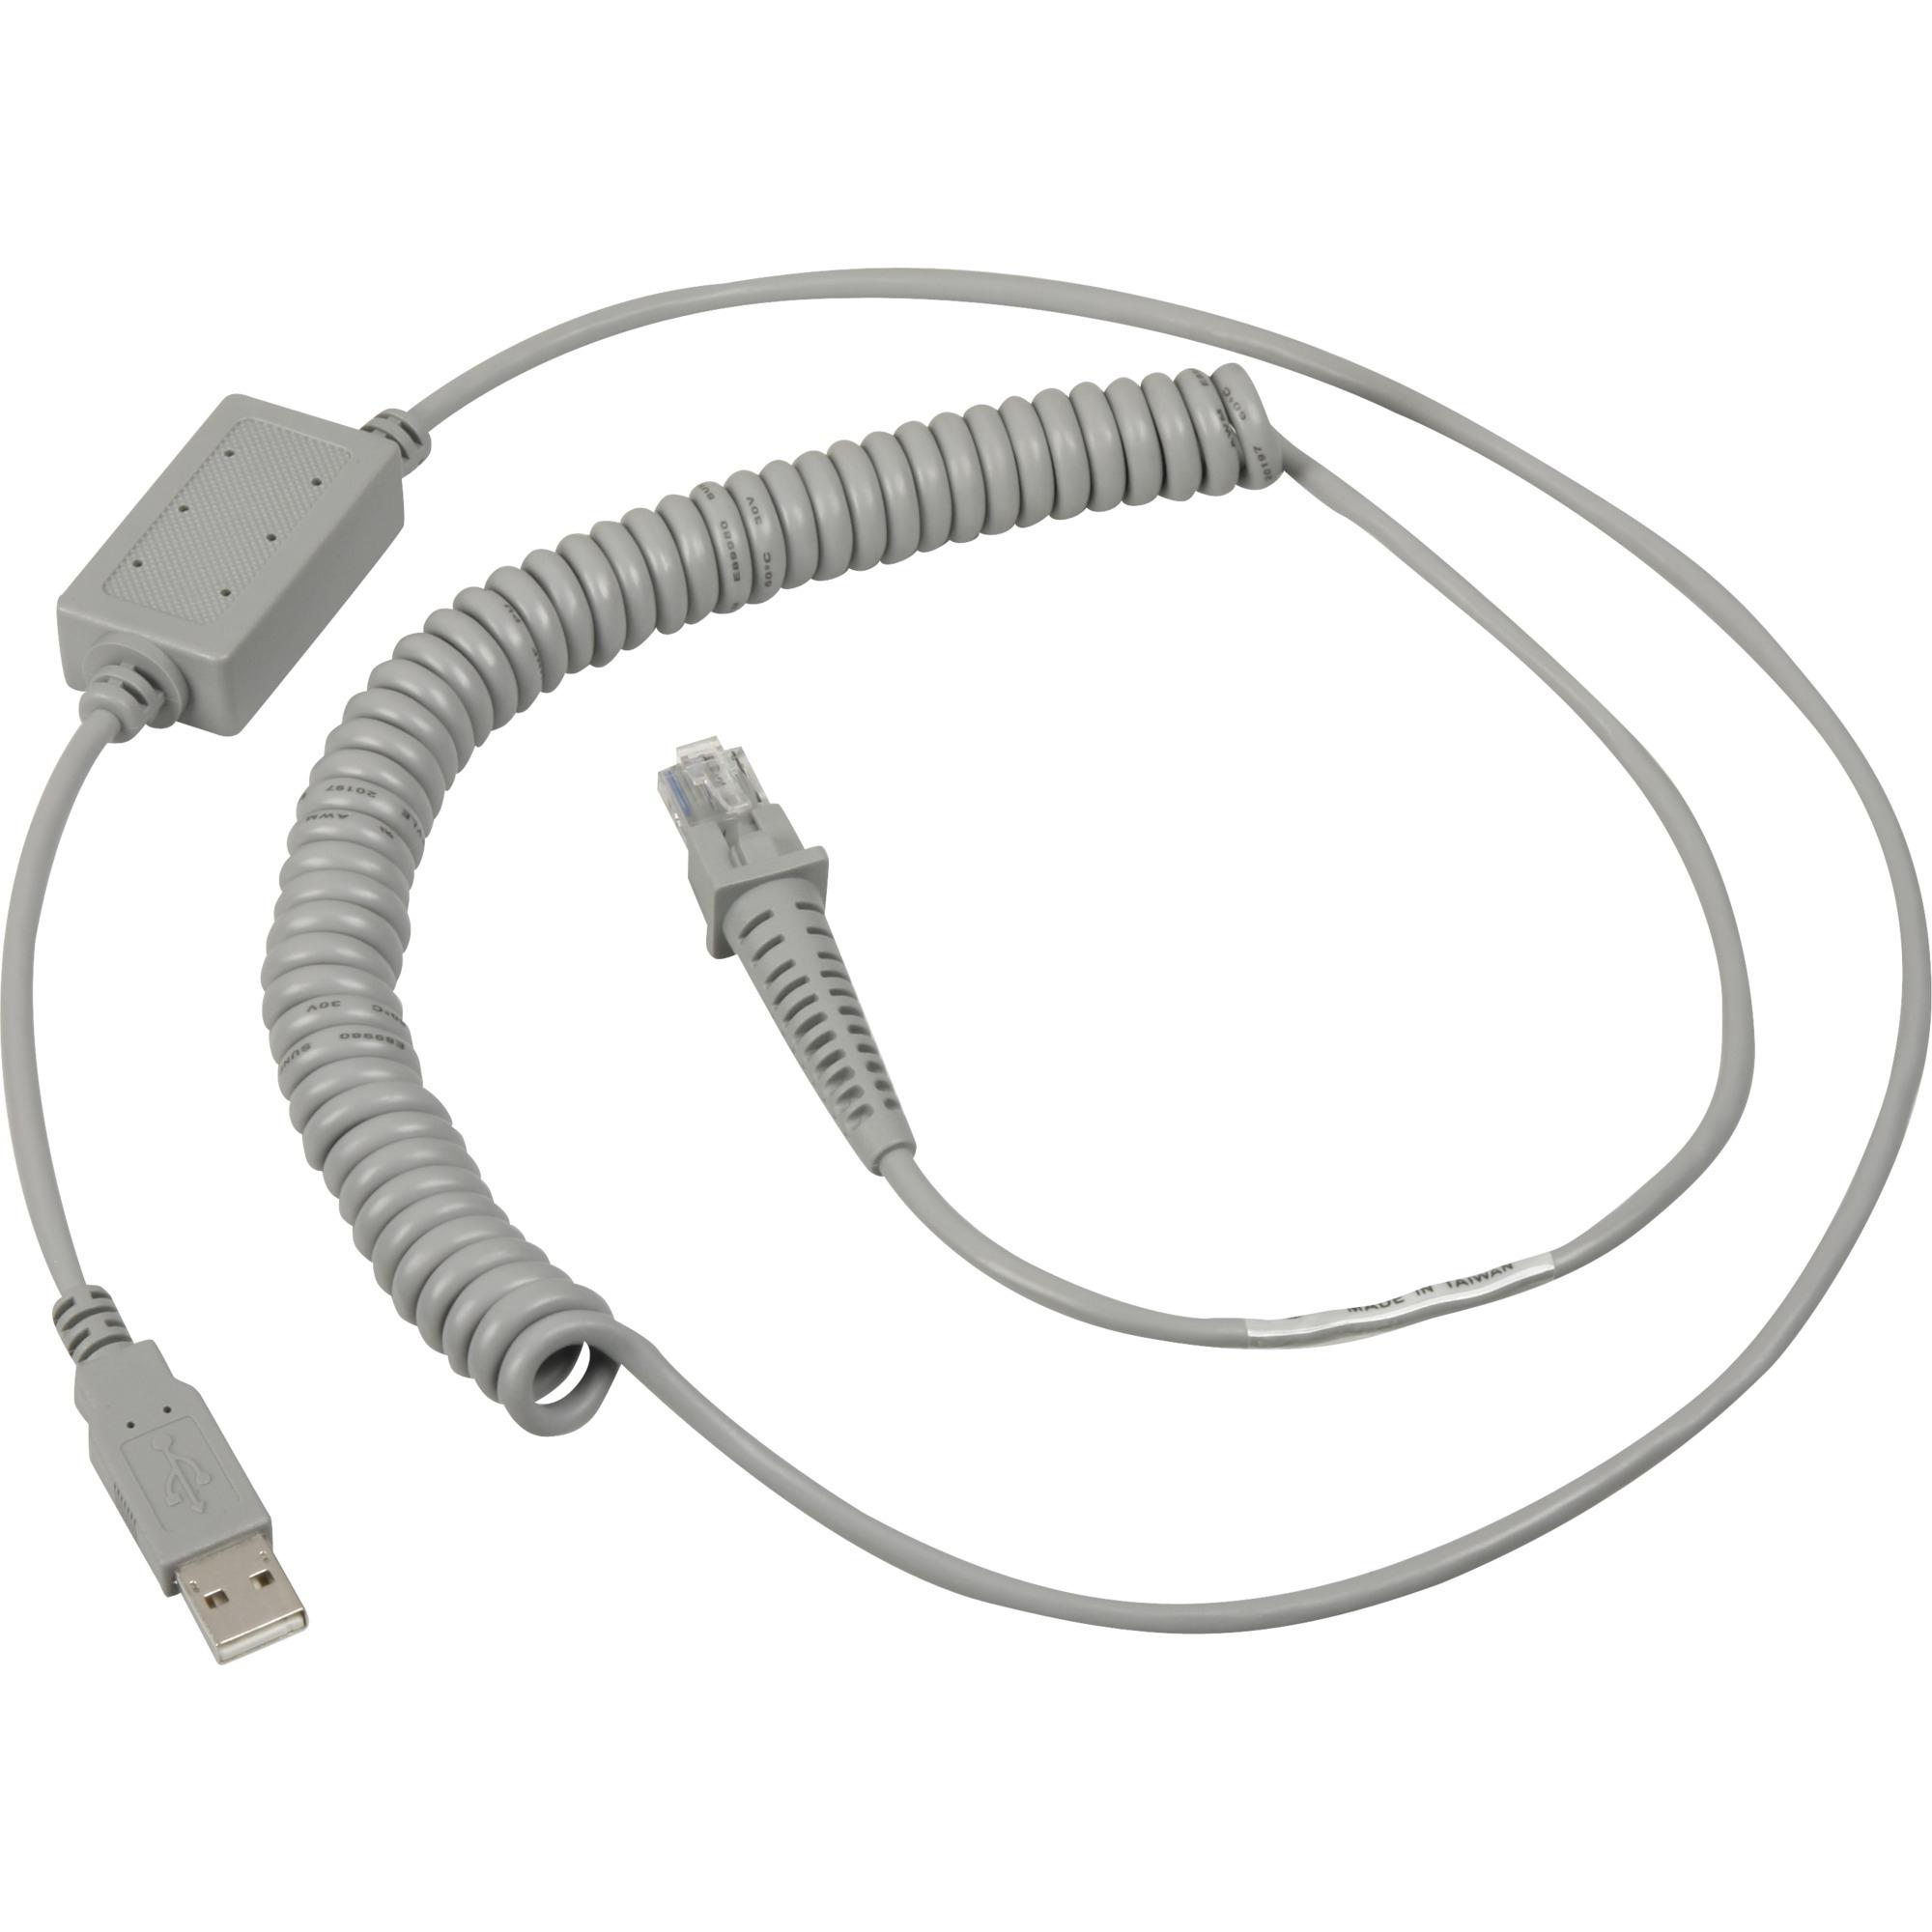 CAB-412 USB, Kabel